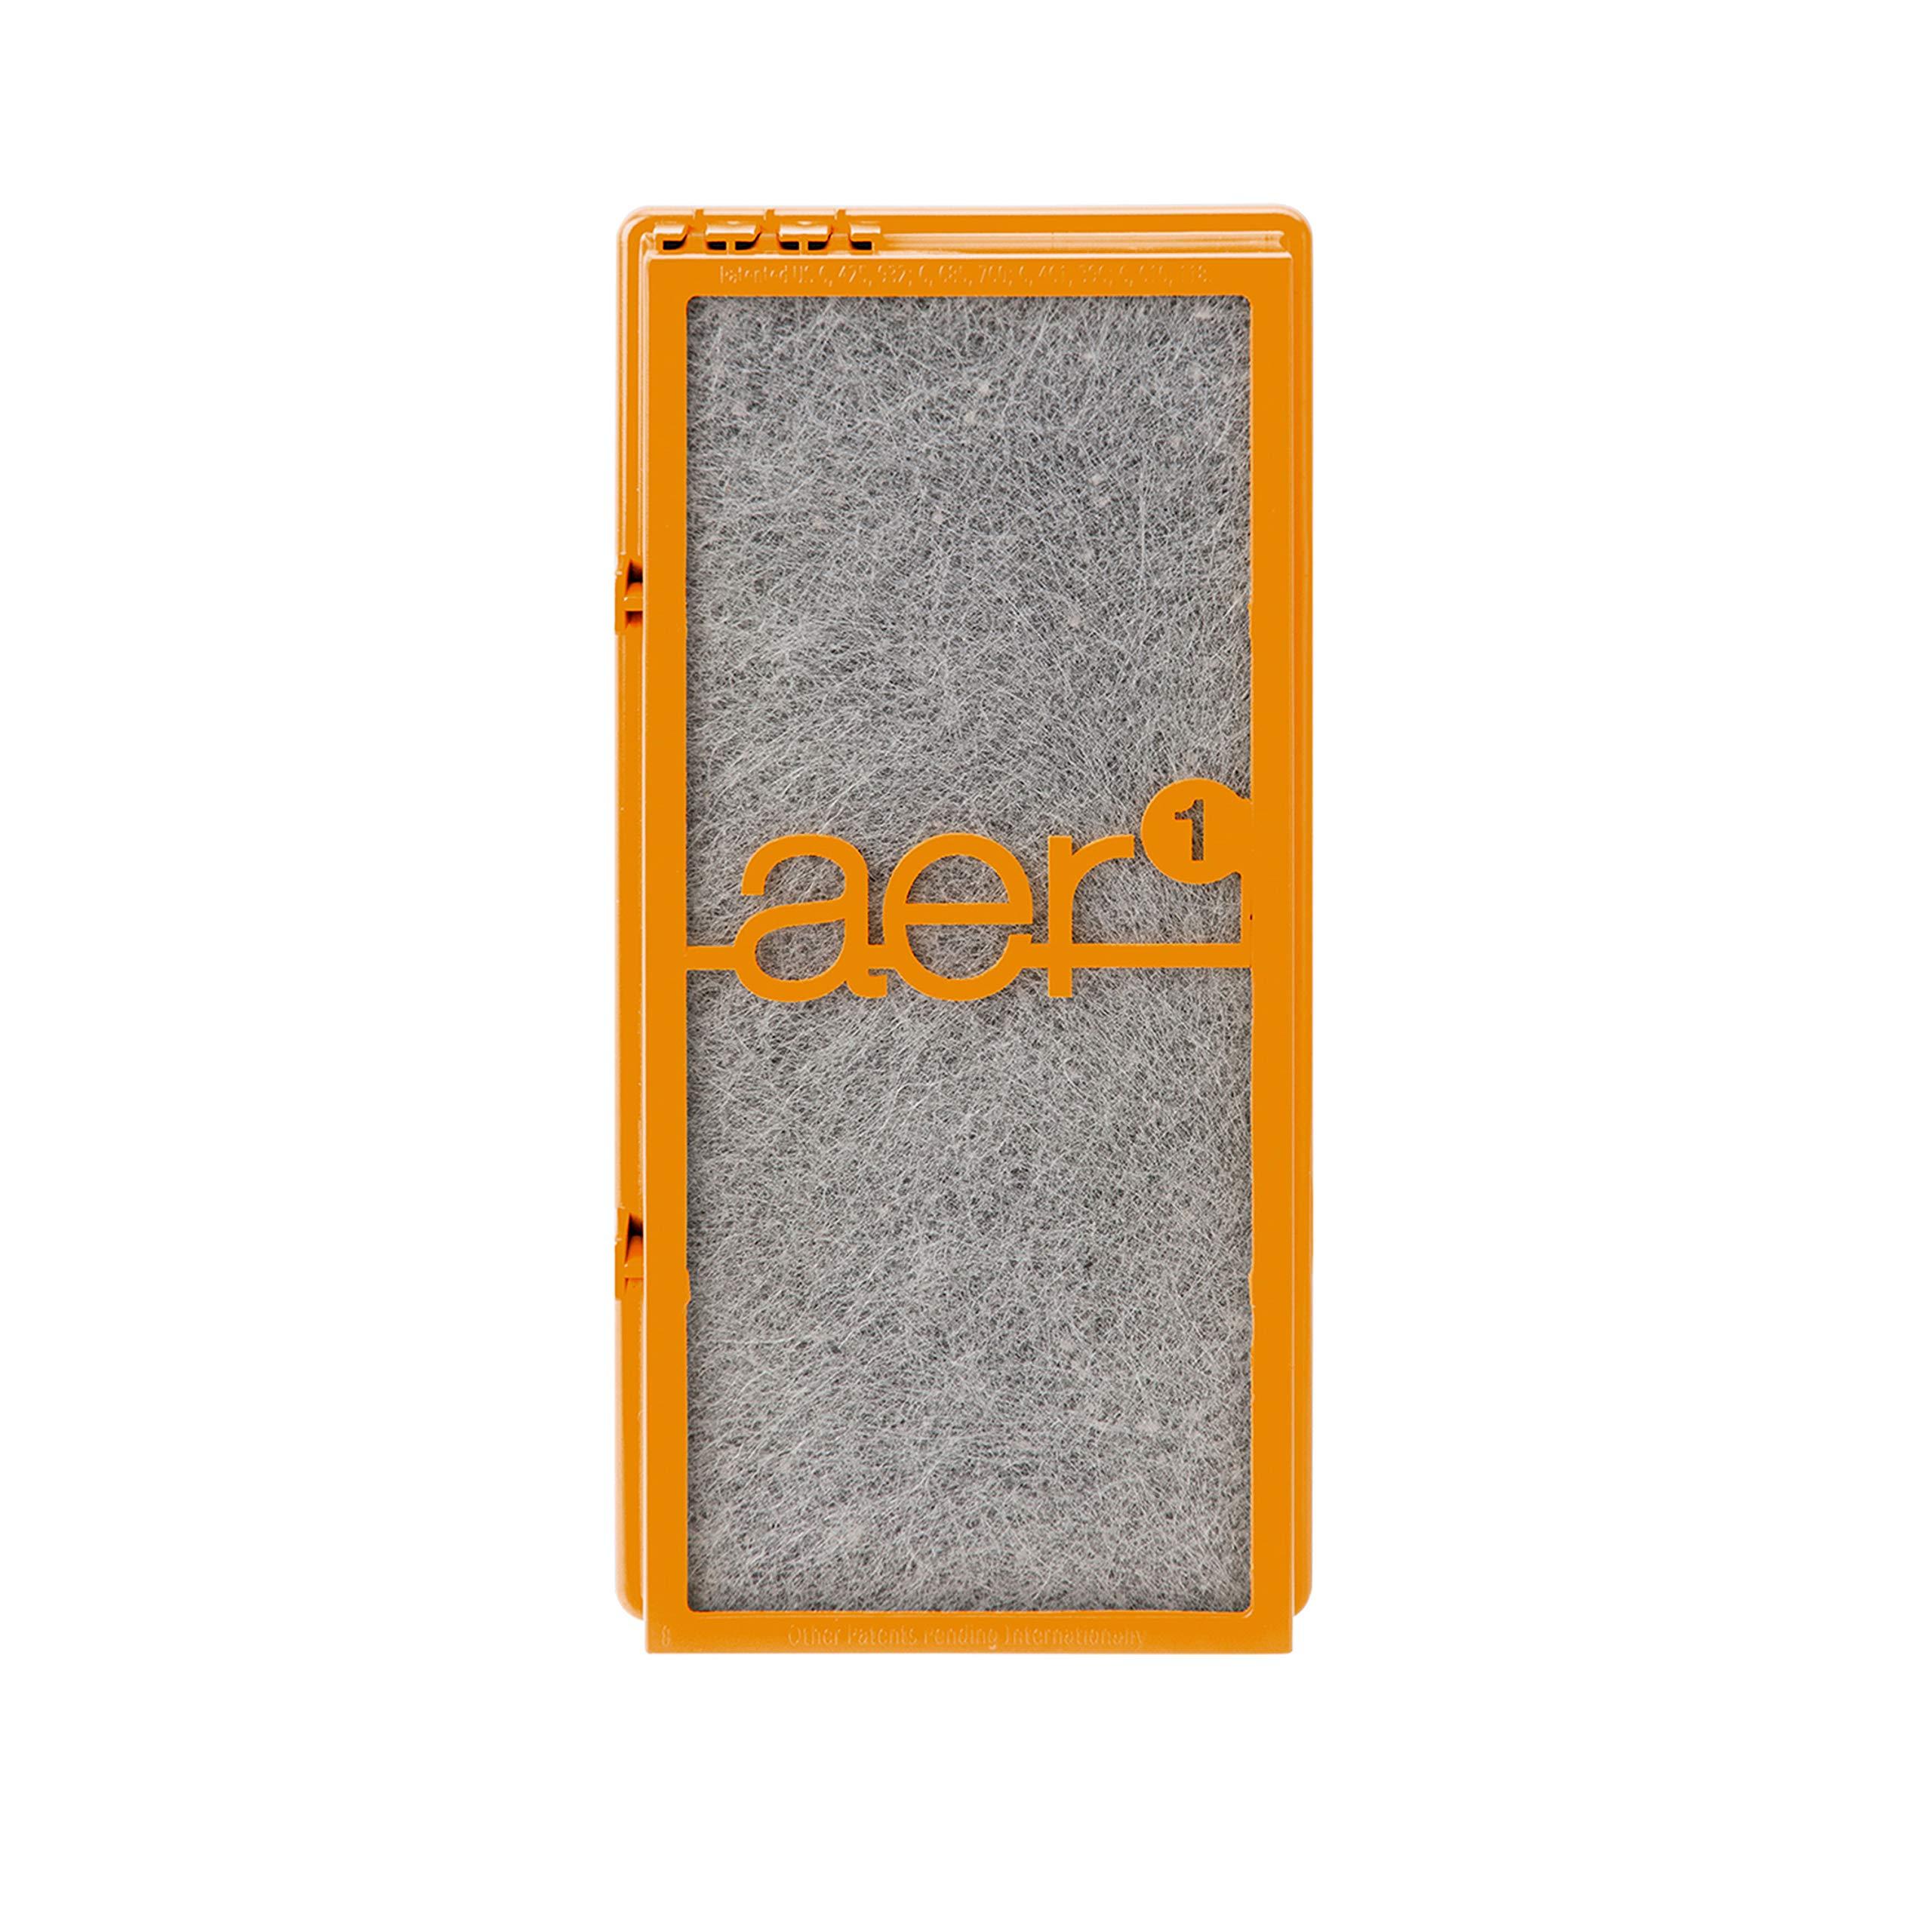 Holmes AER1 Smoke Grabber HEPA Type Filter, HAPF30AS-U4R